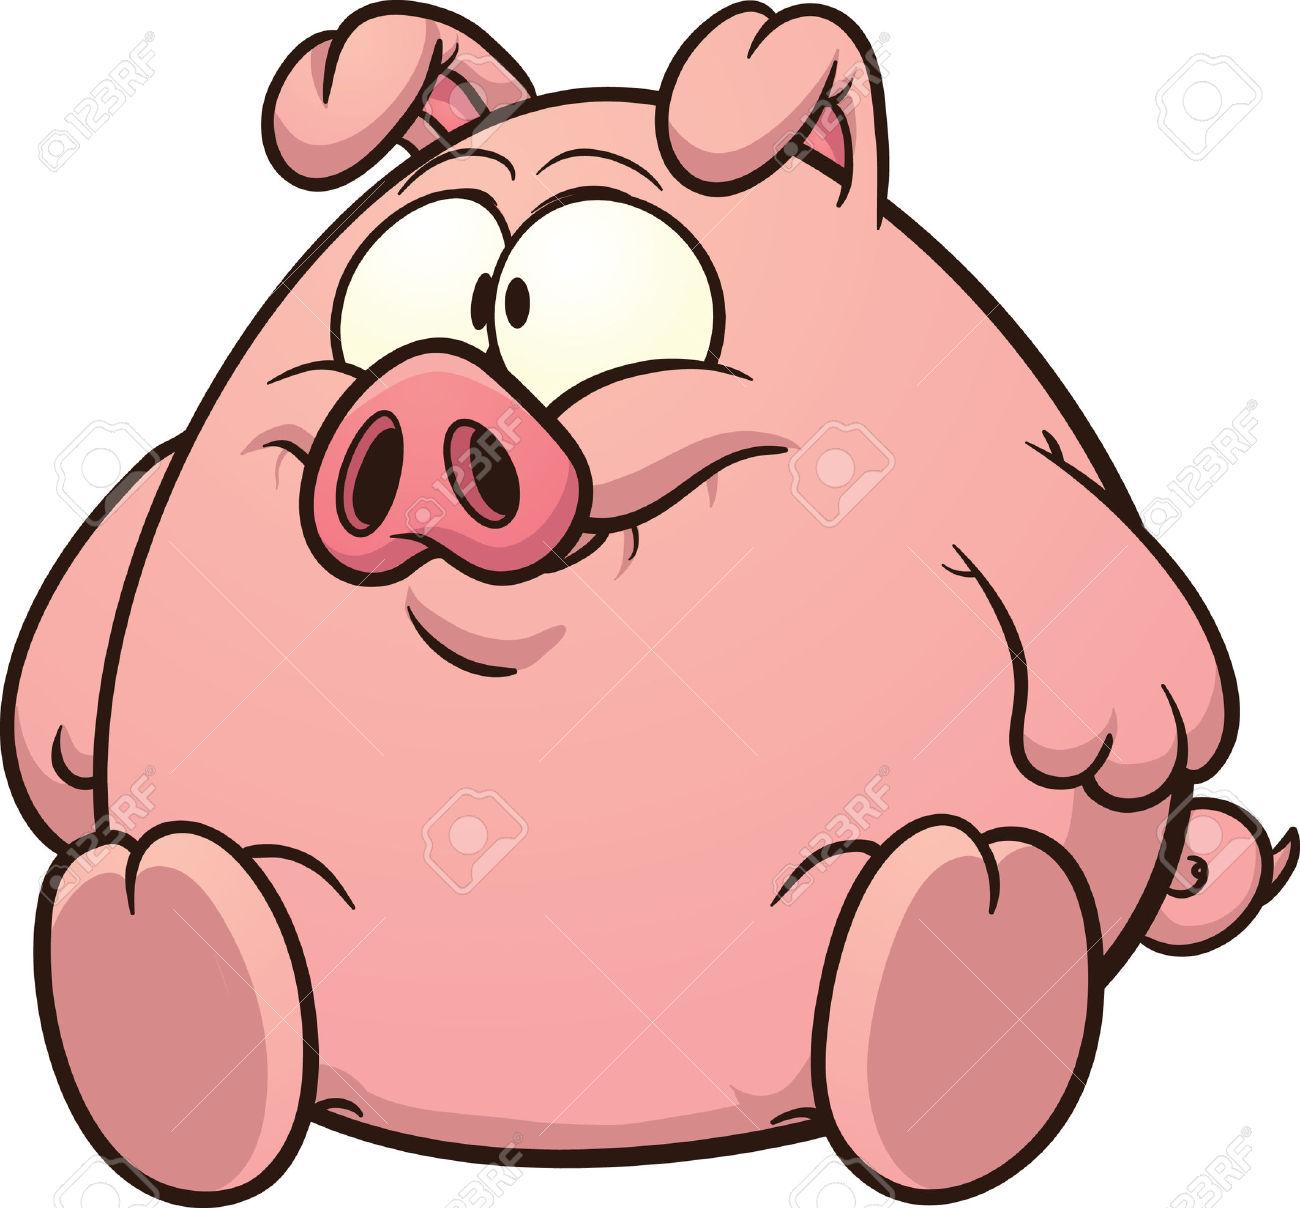 1300x1208 Pig Clipart Cartoon